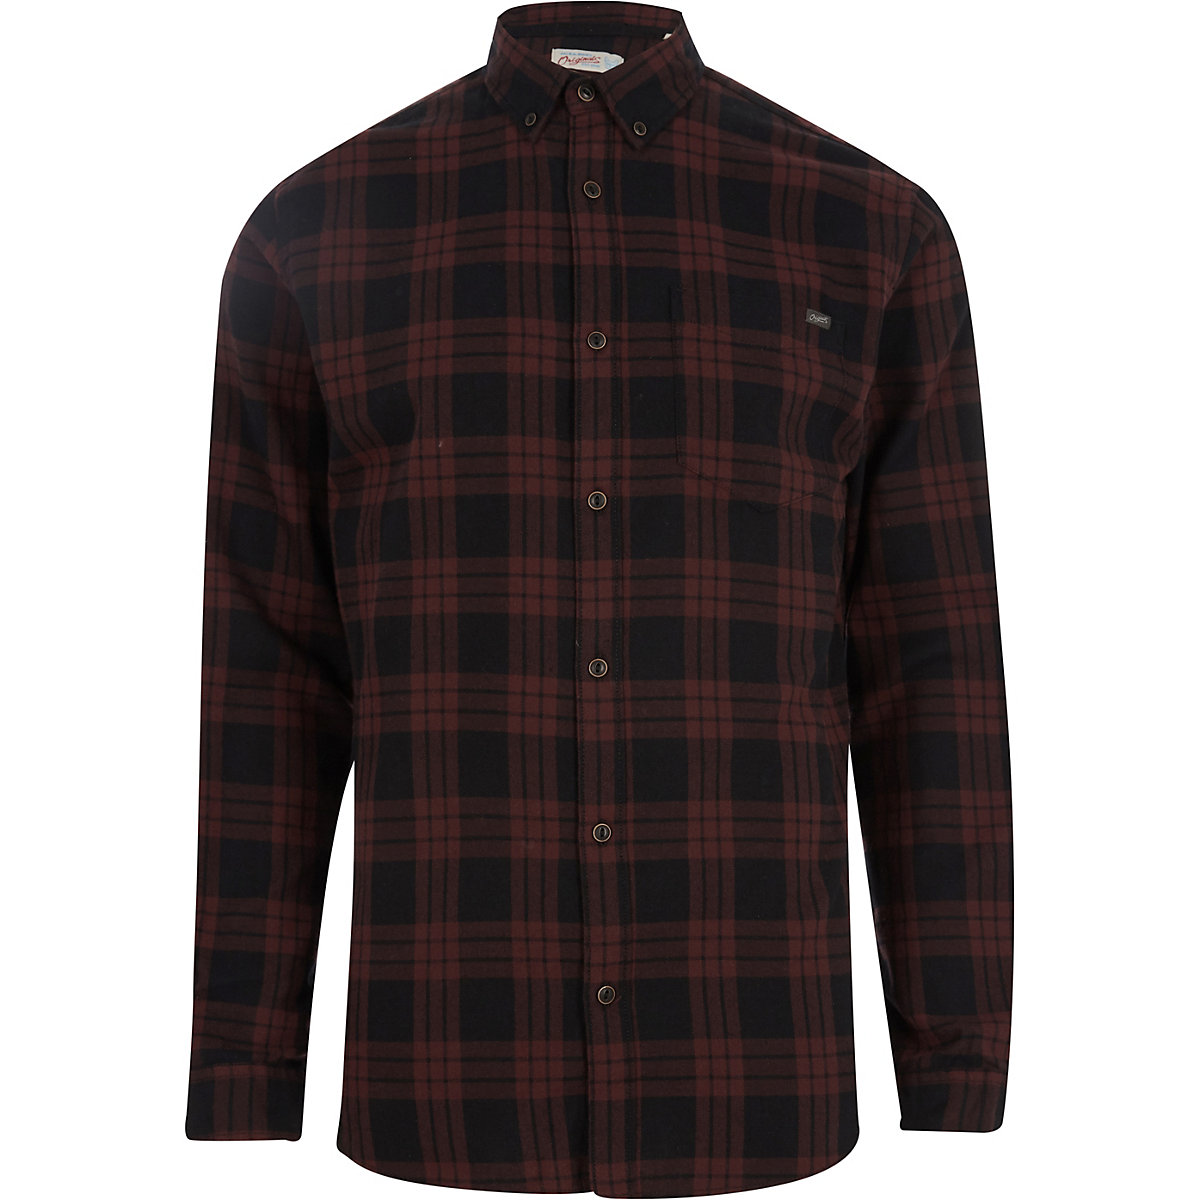 Jack & Jones Originals red check shirt